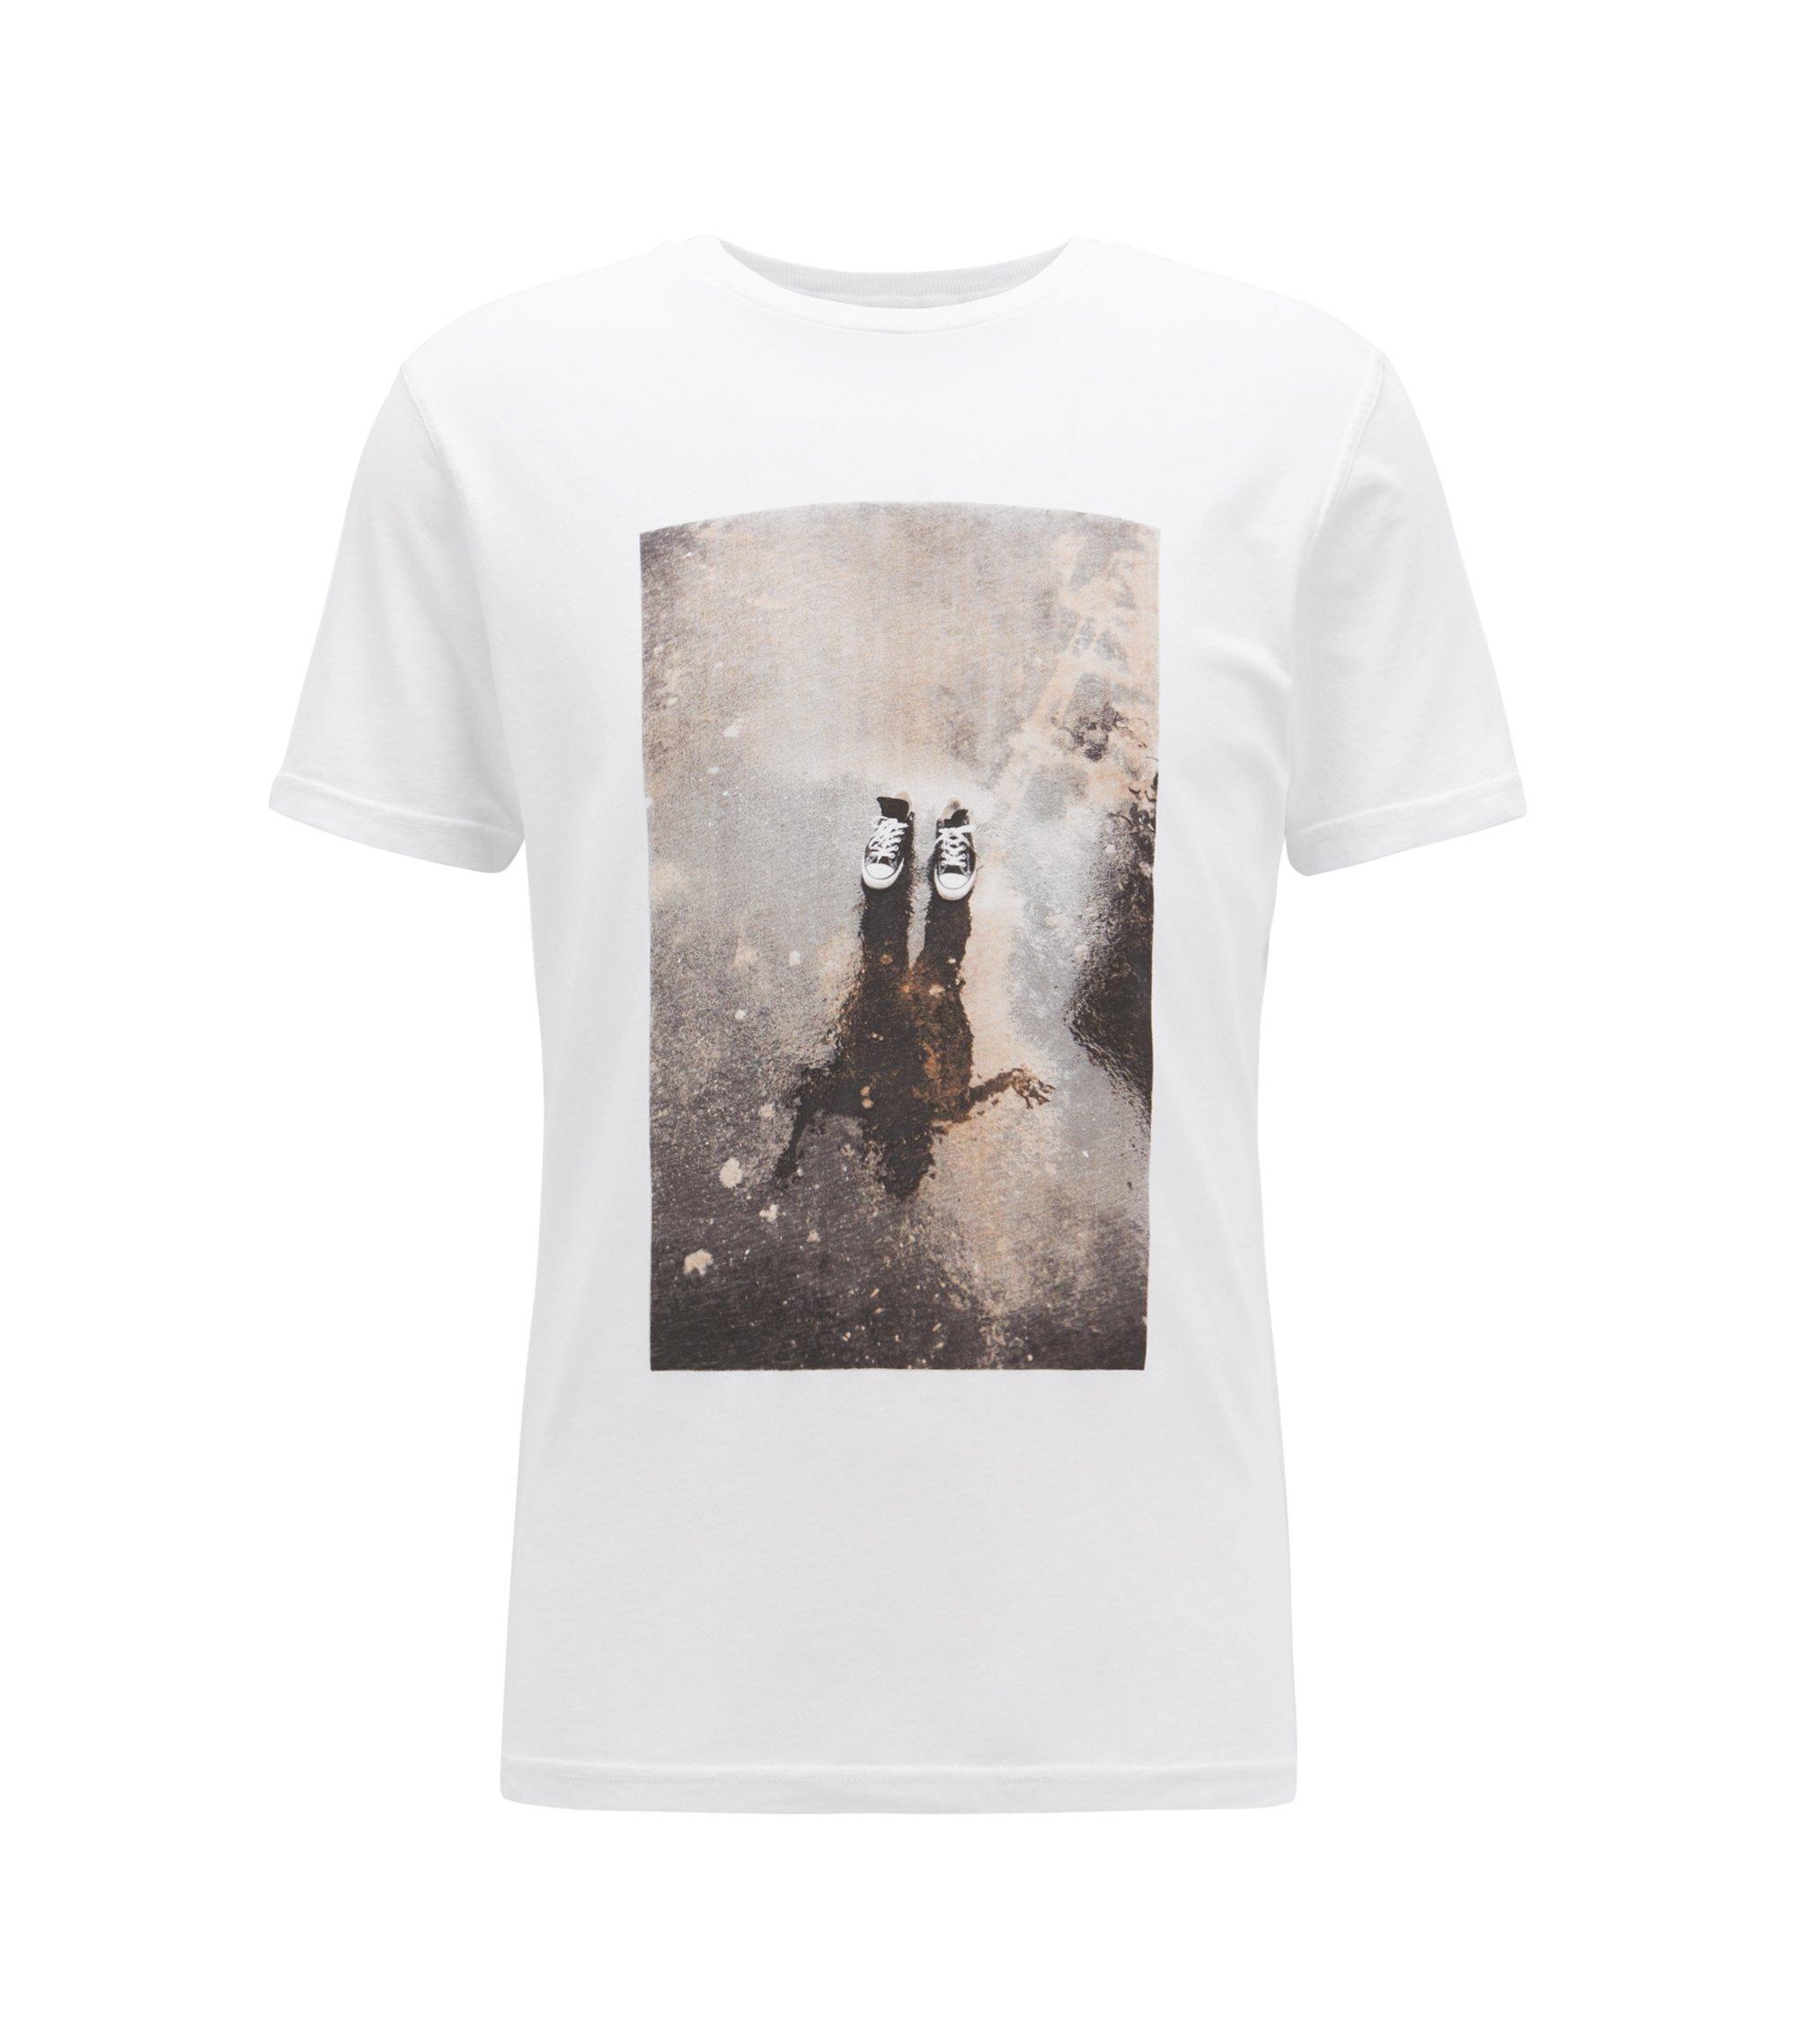 Camiseta gráfica relaxed fit en punto de algodón recot²®, Blanco